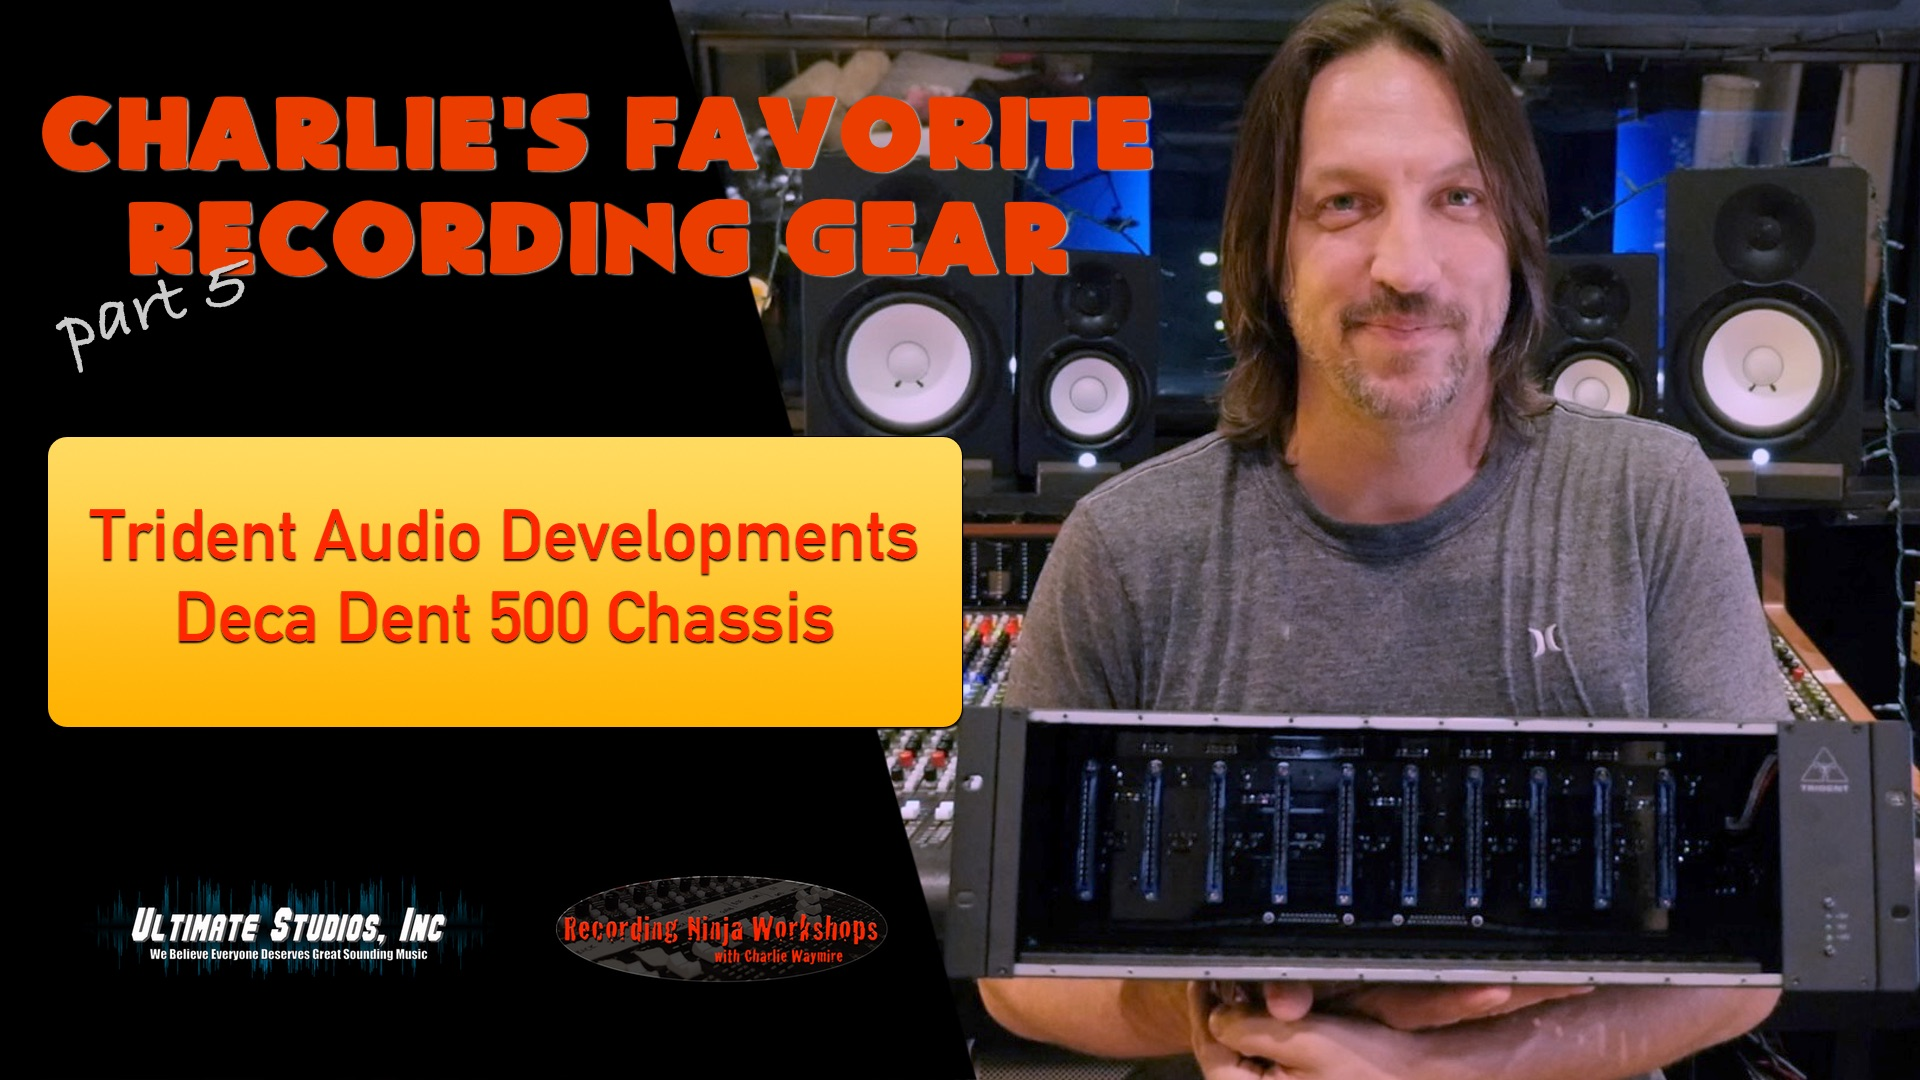 Recording Studio Tools! Trident Deca Dent 500 Rack